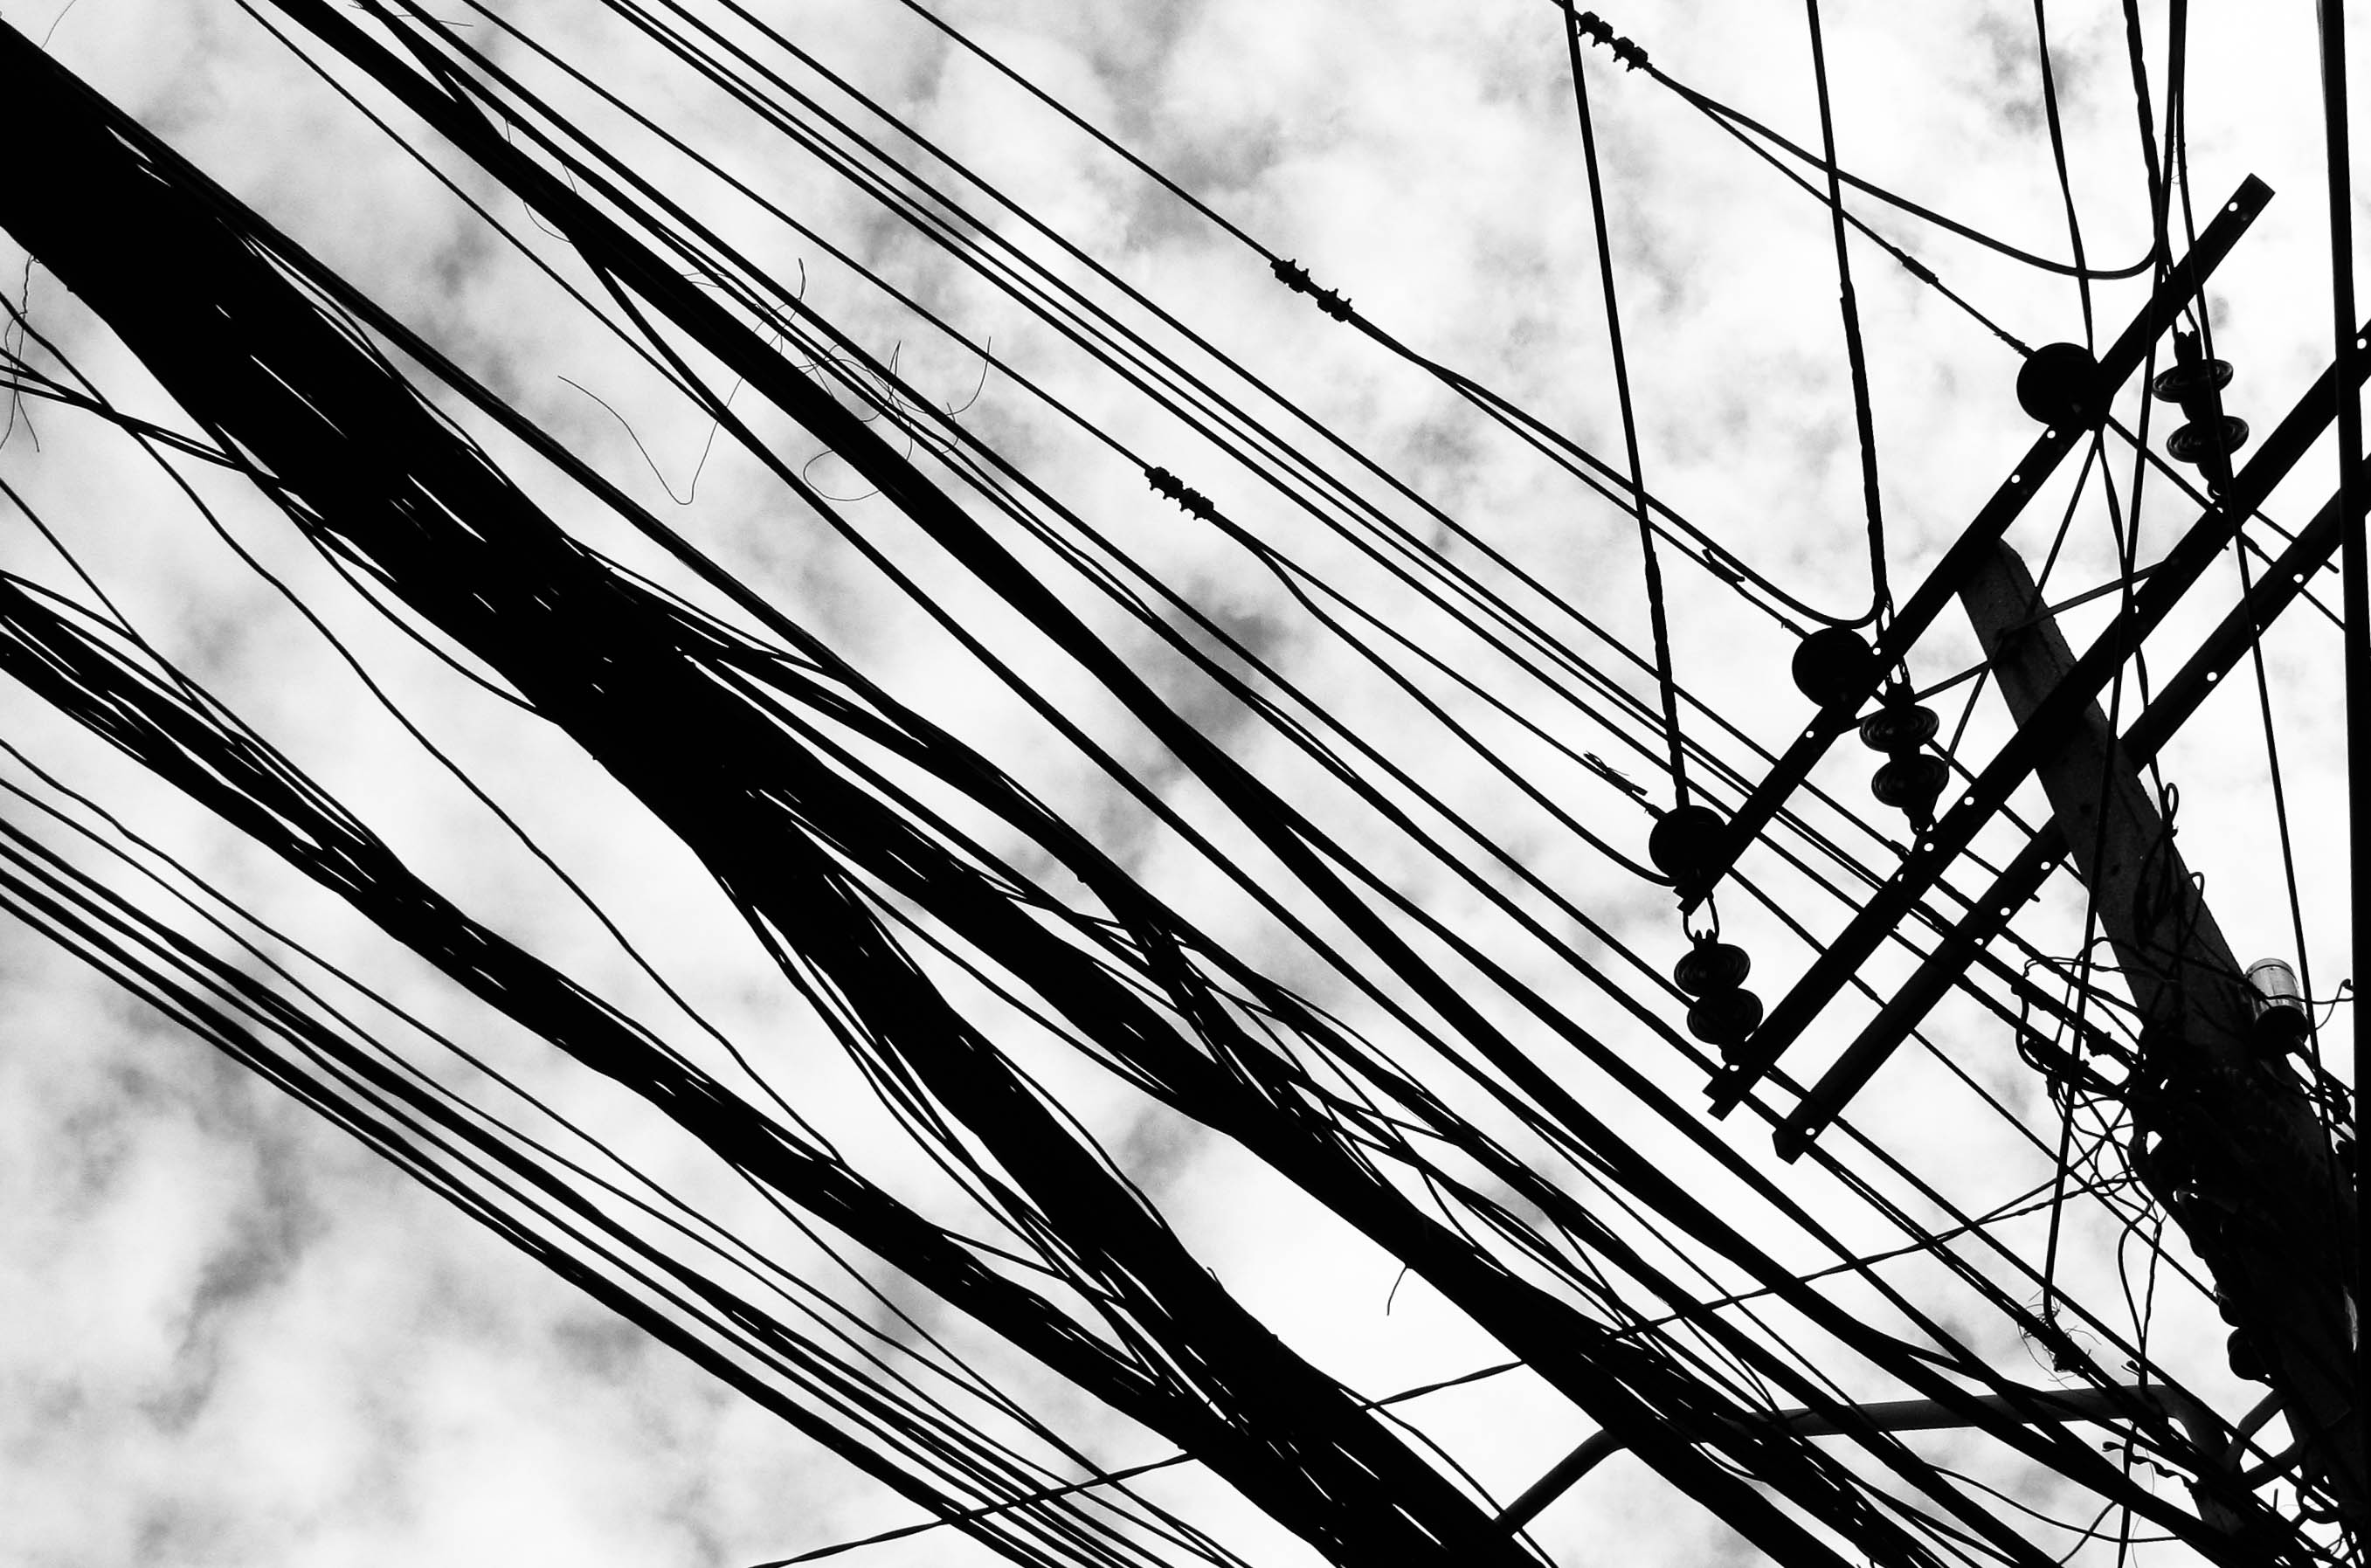 Bangkok overhead wires